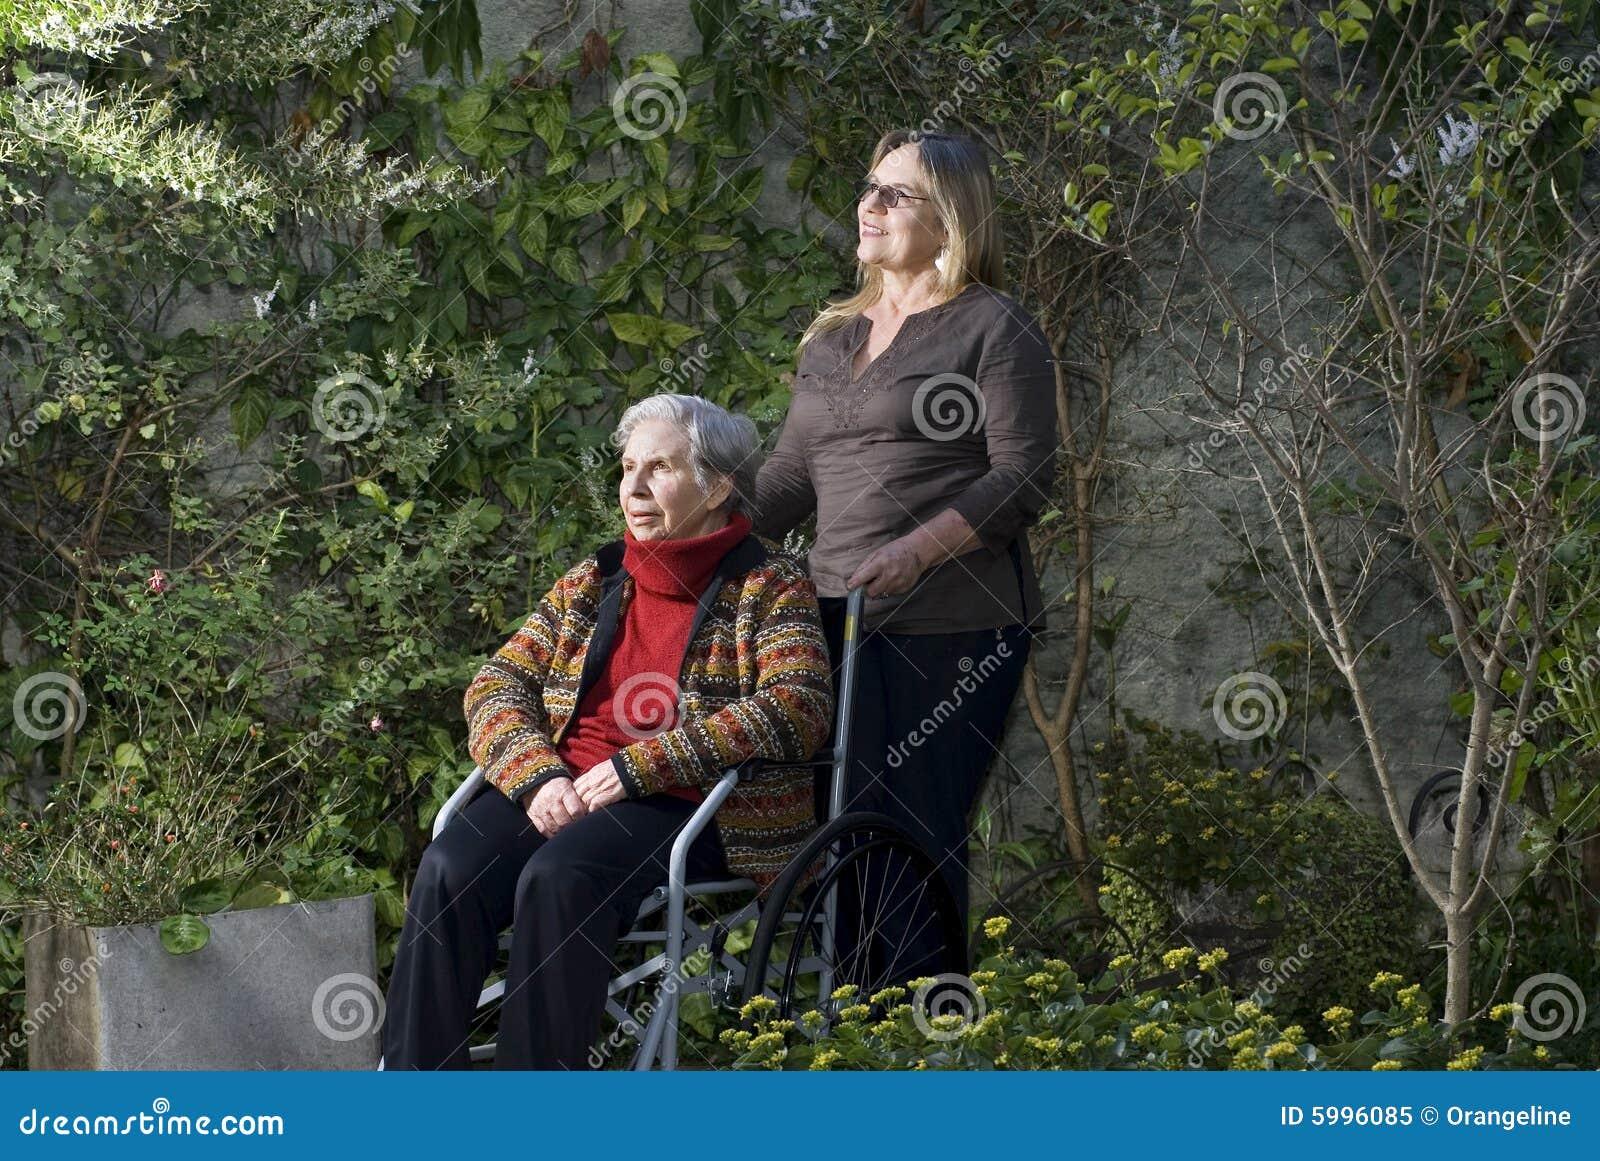 fotos jardim horizontal : fotos jardim horizontal:Mulher Com A Matriz No Jardim – Horizontal Foto de Stock Royalty Free